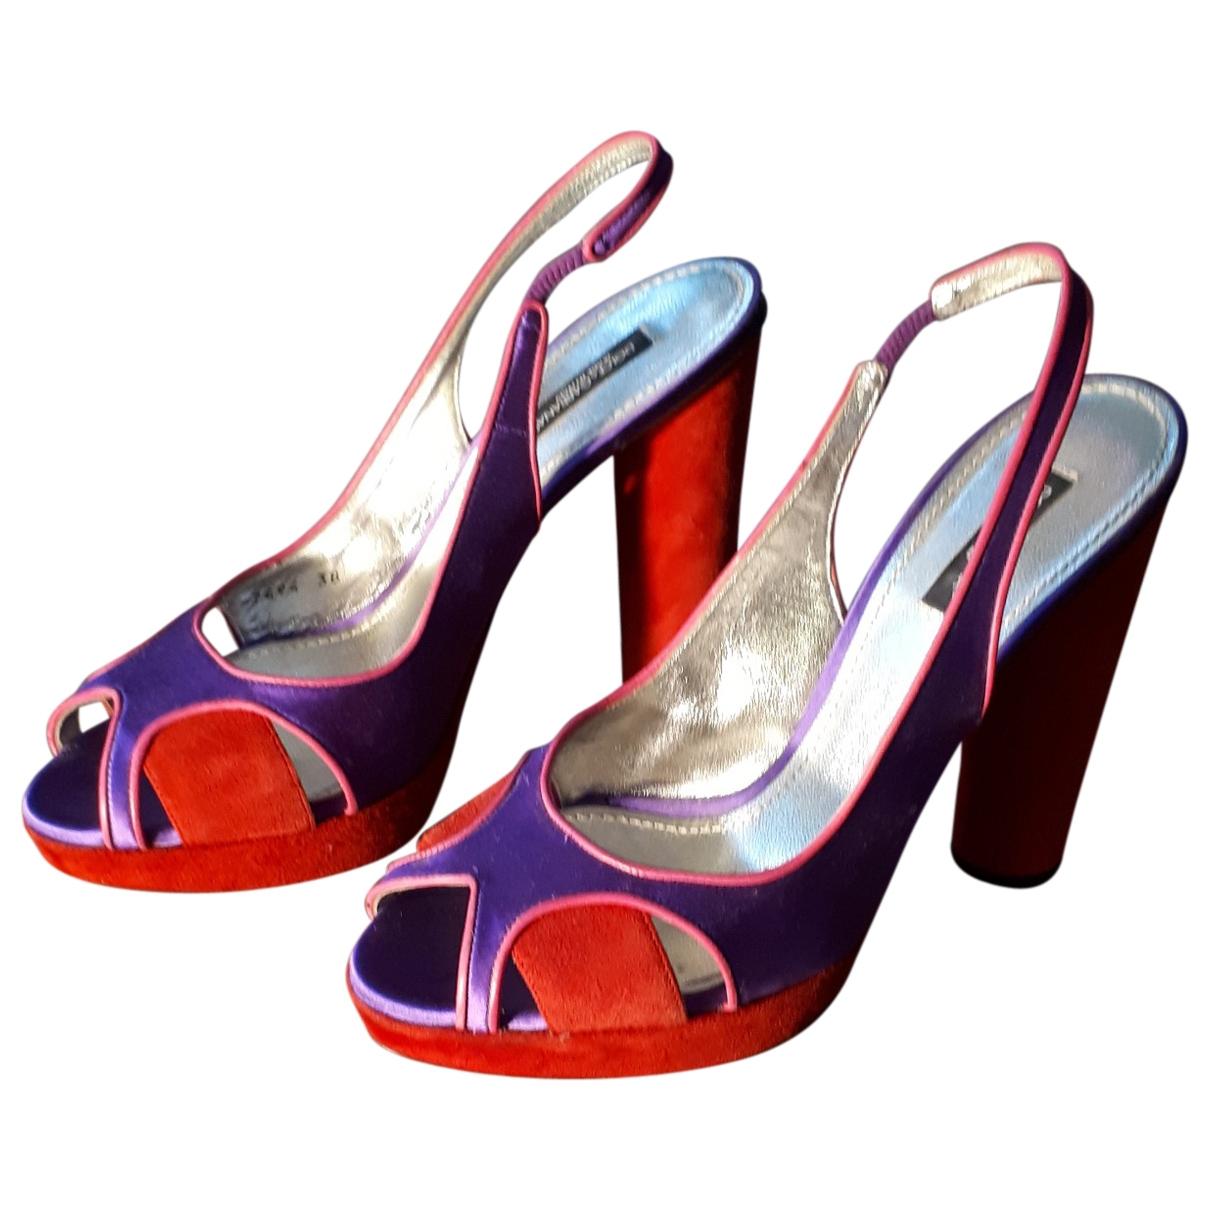 Dolce & Gabbana \N Sandalen in  Lila Leinen